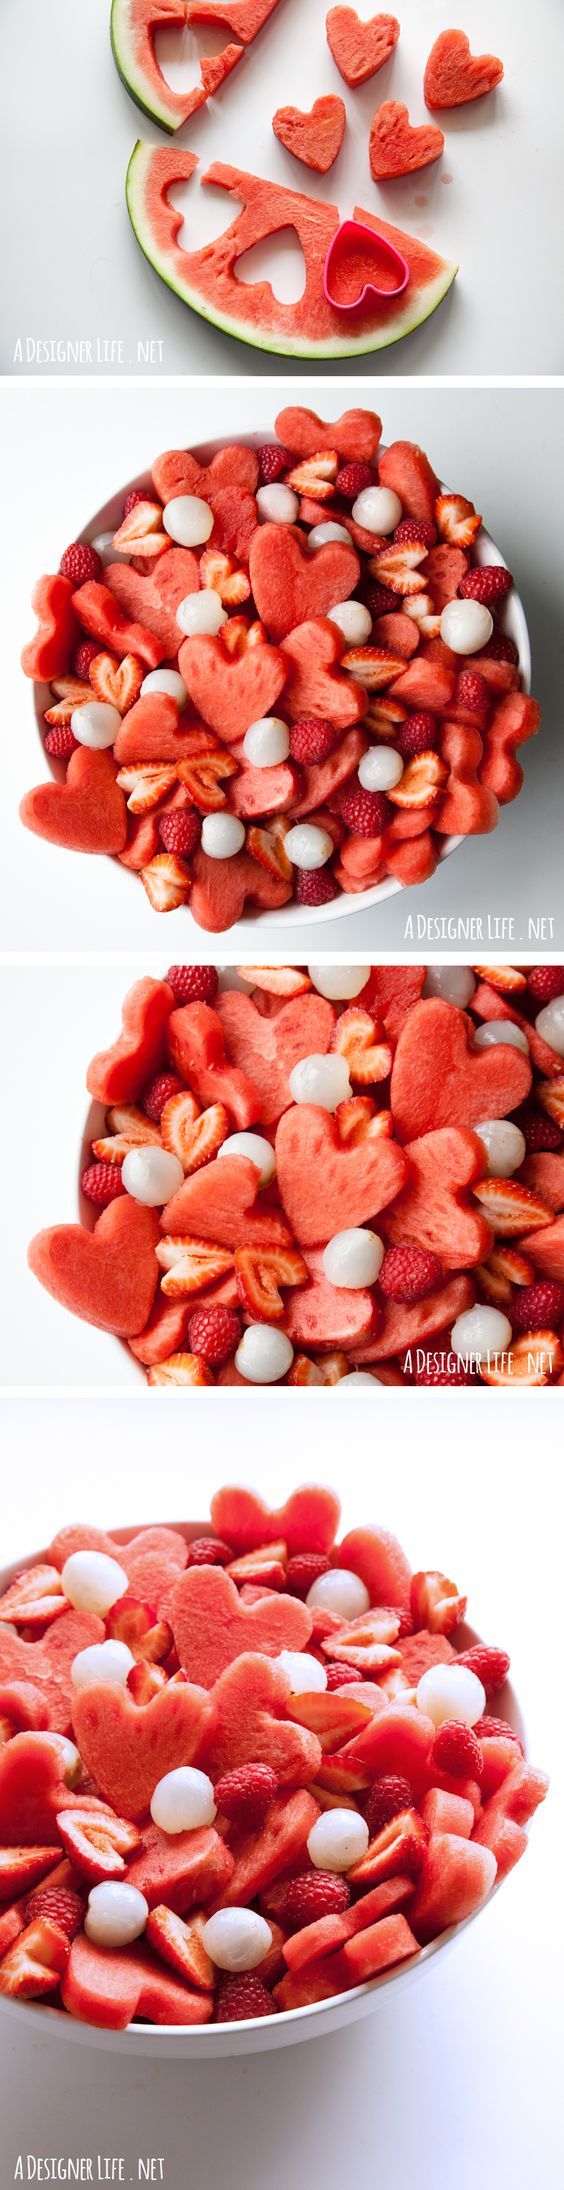 comidas romanticas fruta